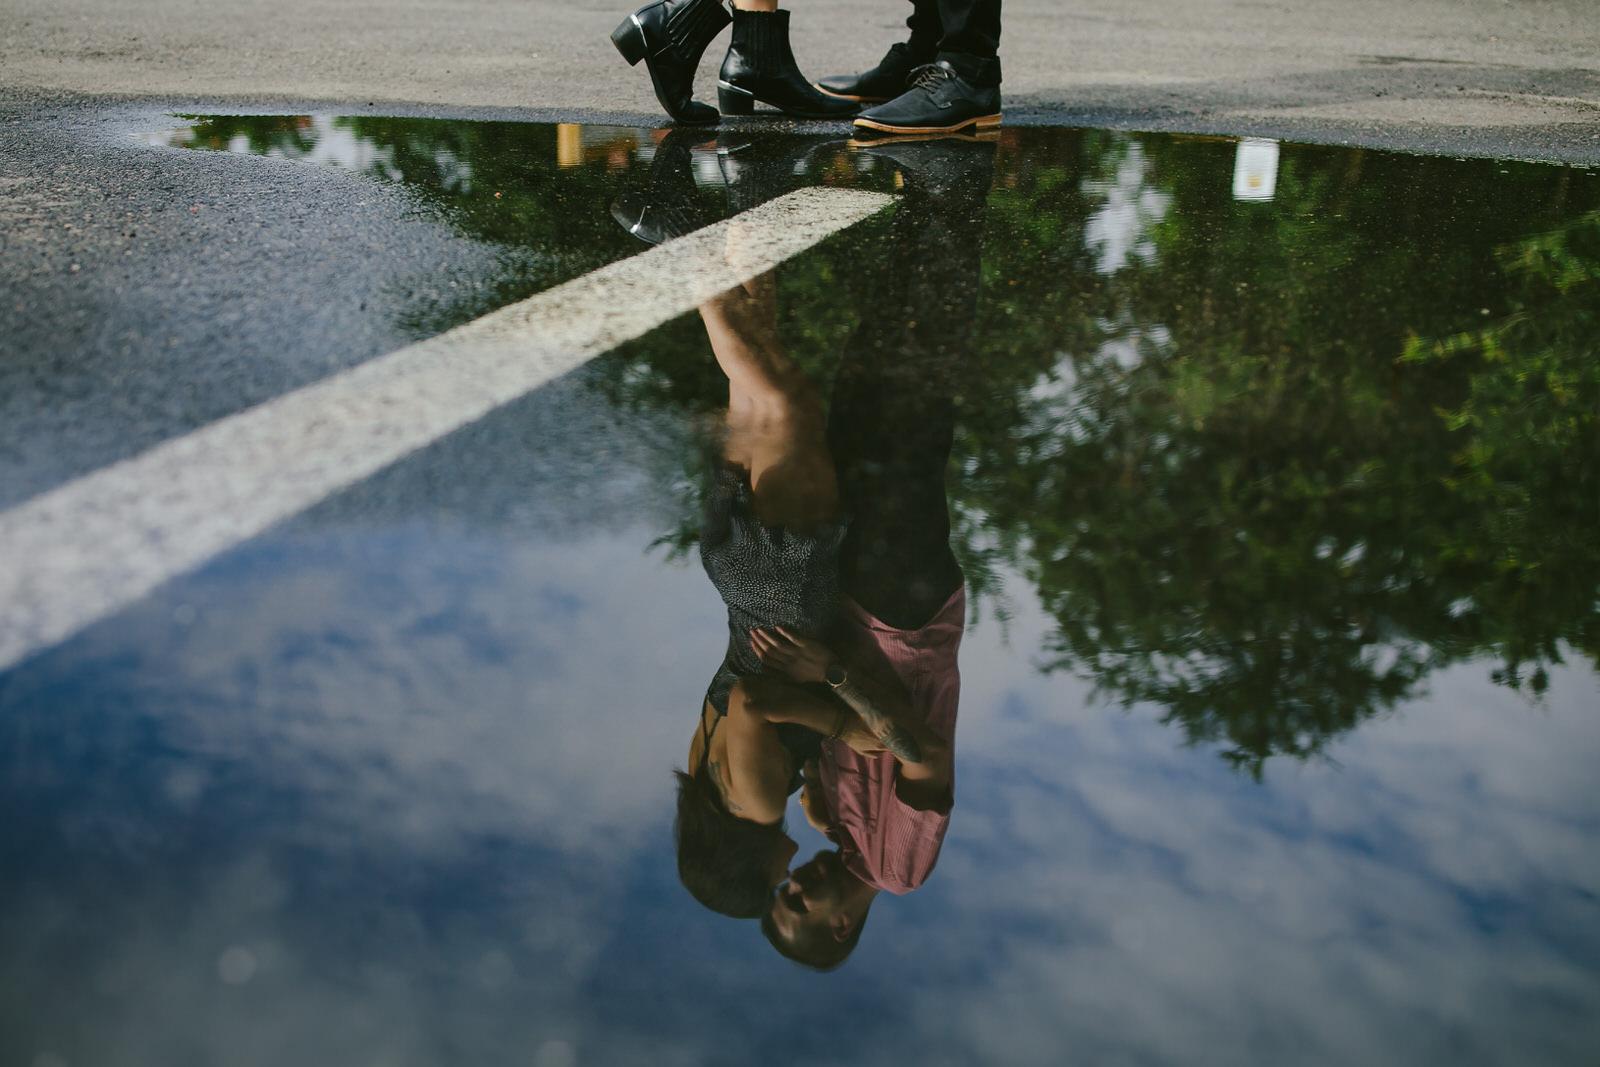 creative-couples-portraits-tiny-house-photo-murray-hill-jacksonville-photographer.jpg